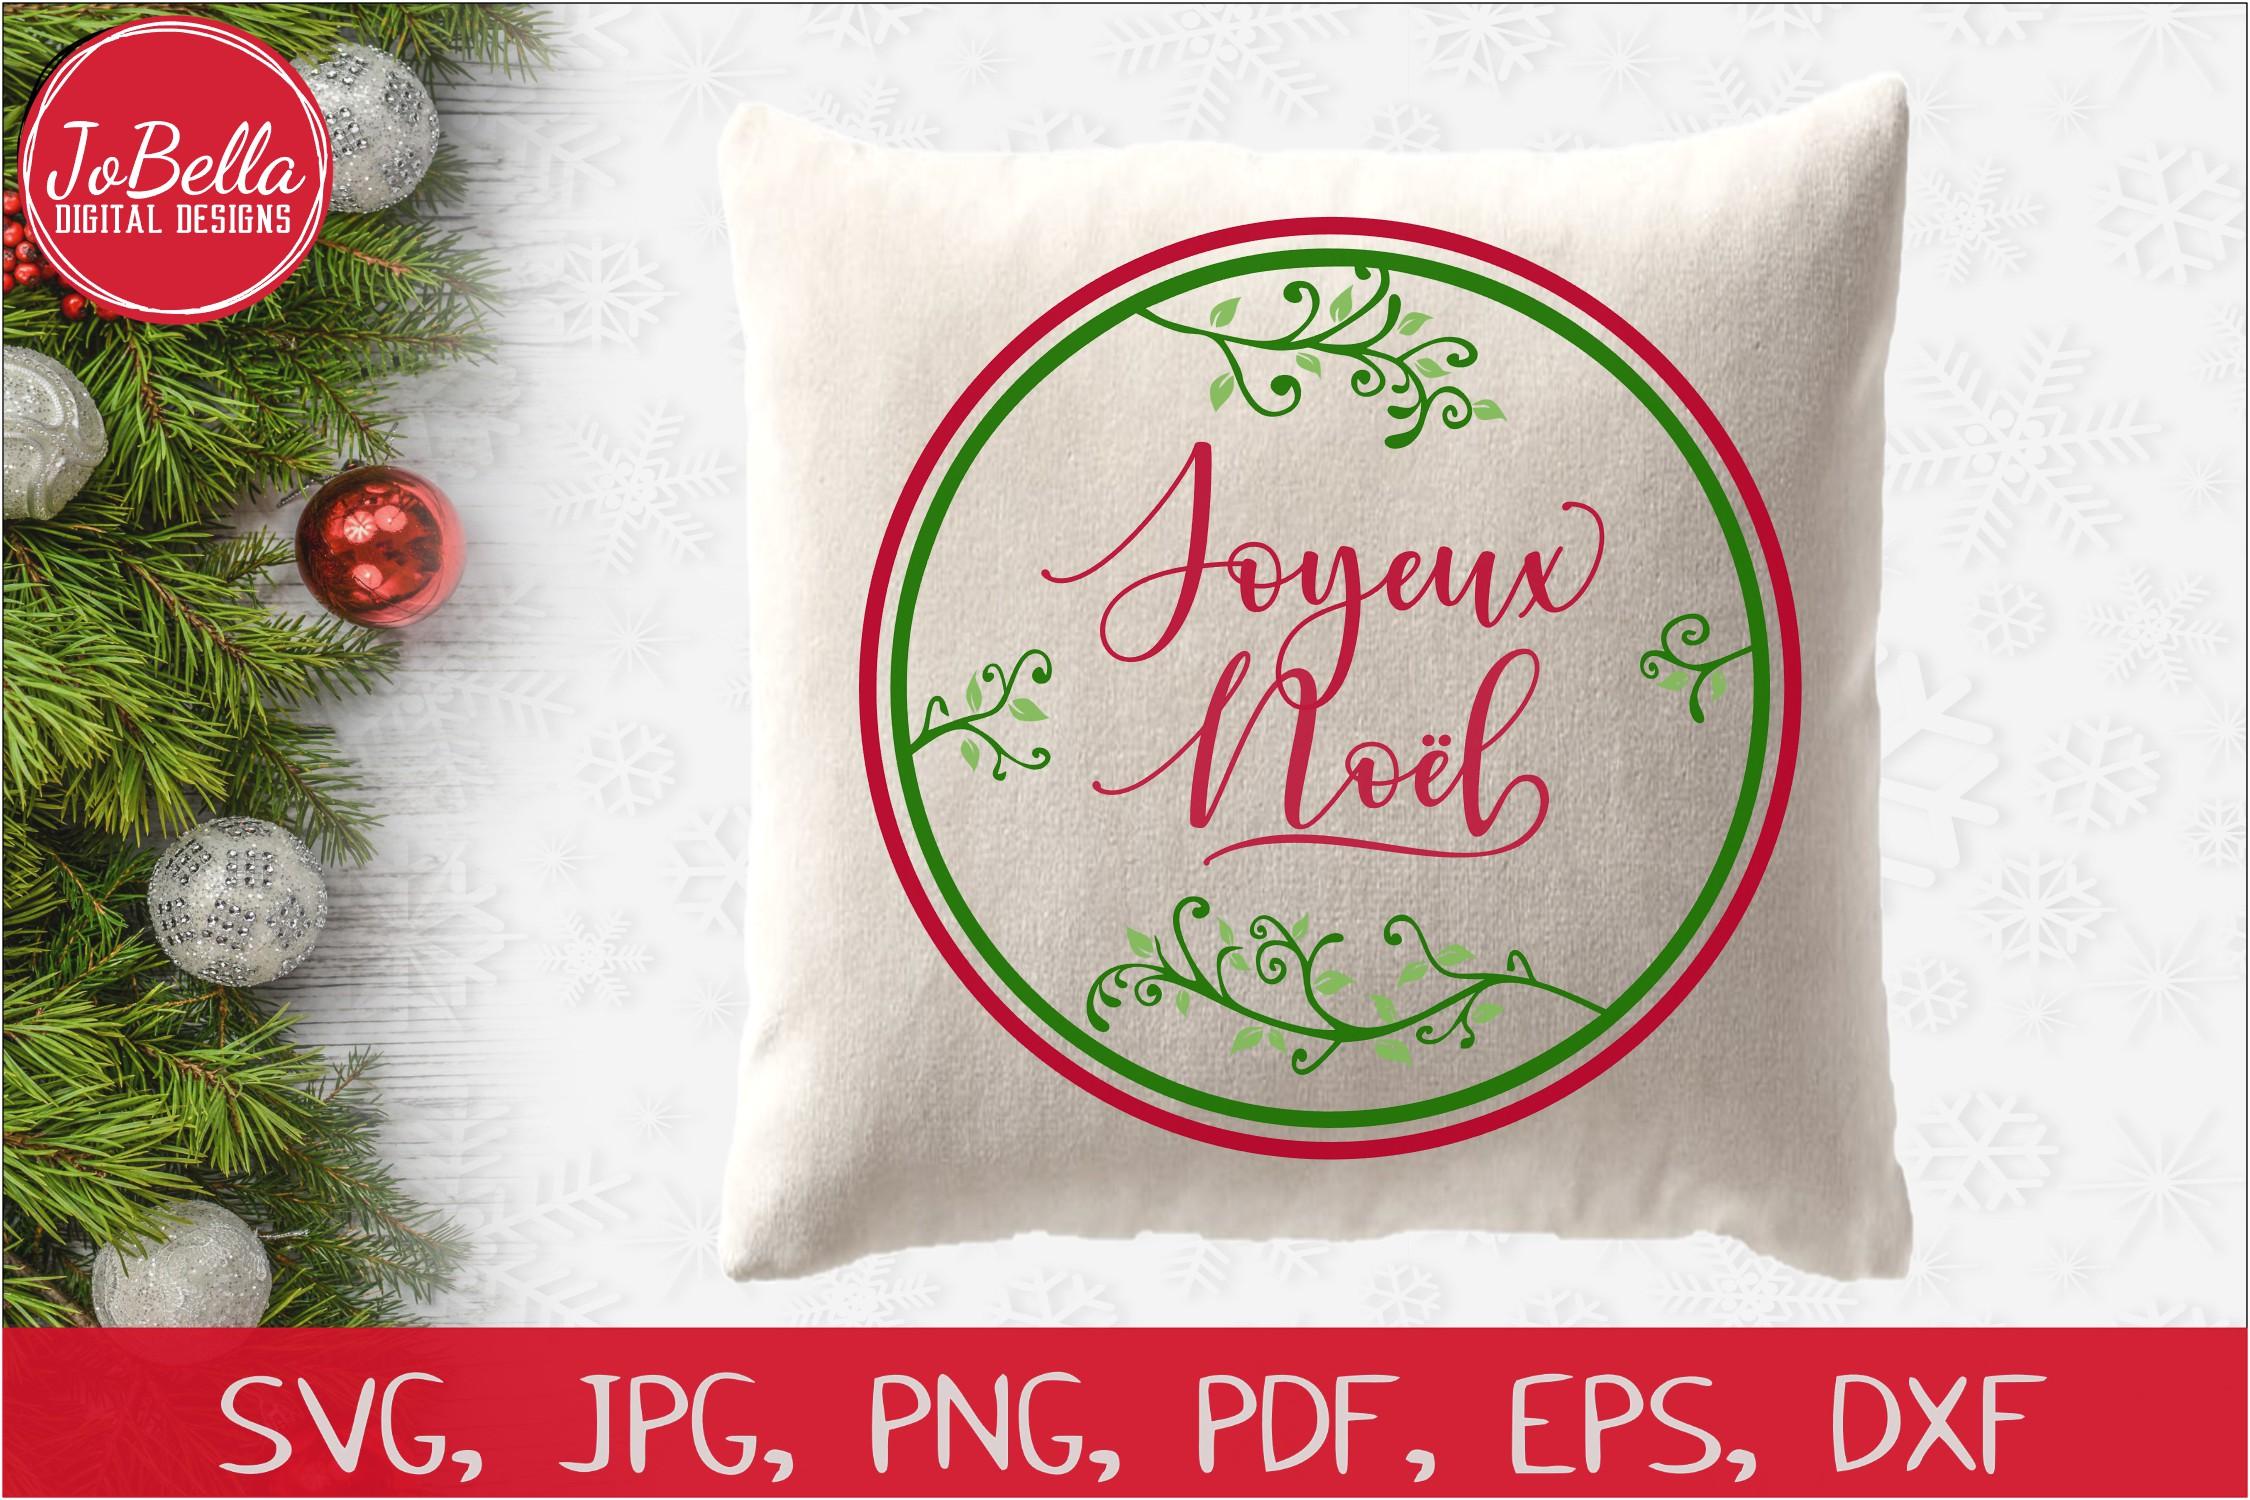 Joyeux Noel SVG Printable & Sublimation PNG example image 2